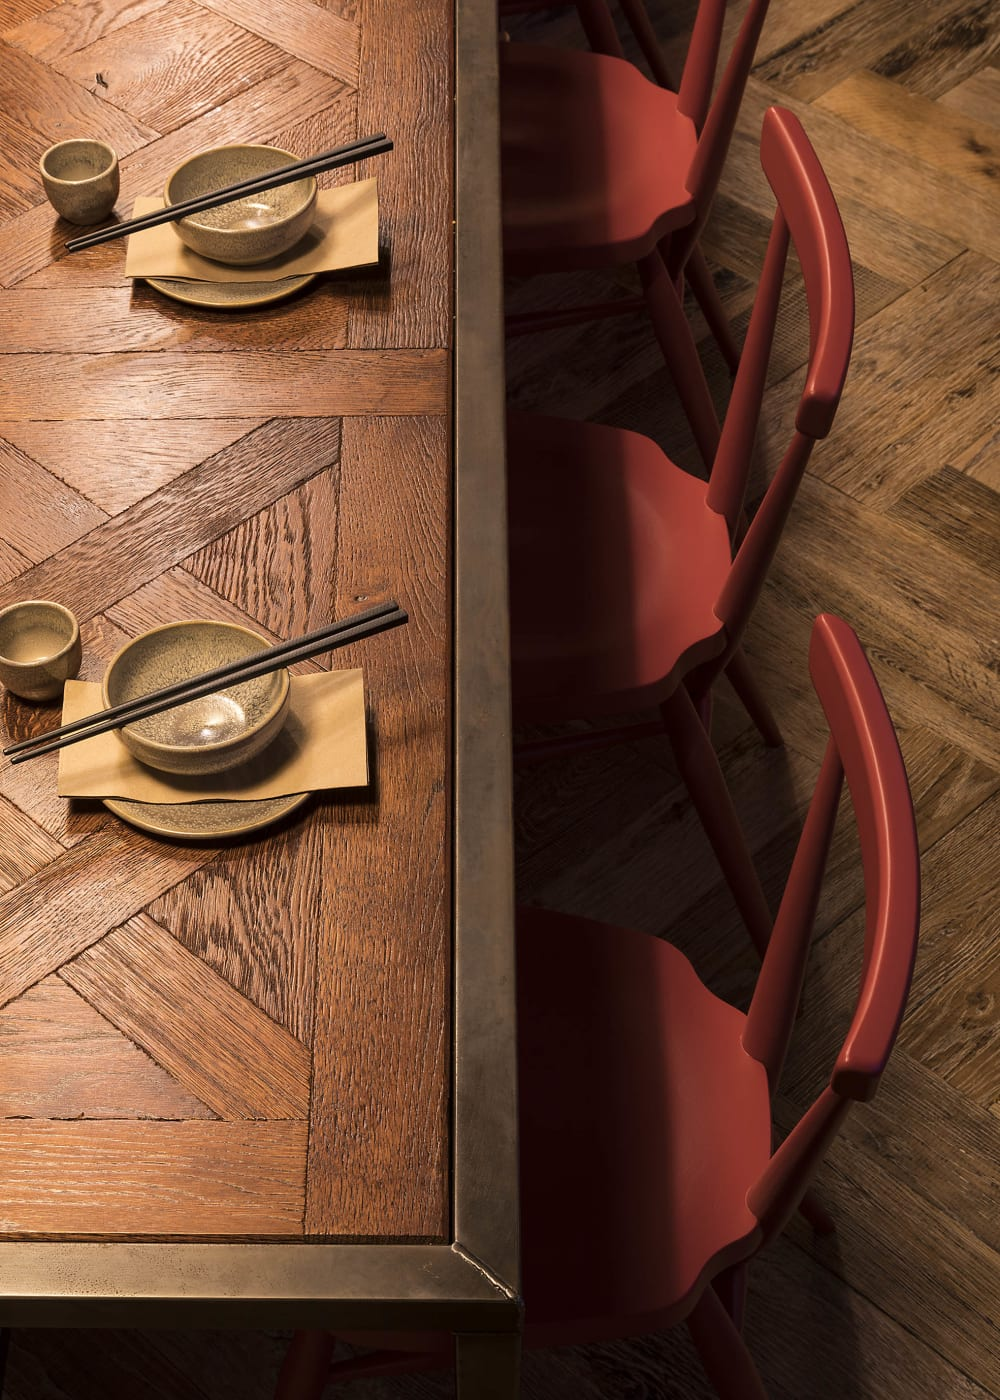 Project   AU   Relik   RECM2025   Reclaimed Barn Oak   Versailles   HW1391   Antique   Peking Square   Table and Floor 4